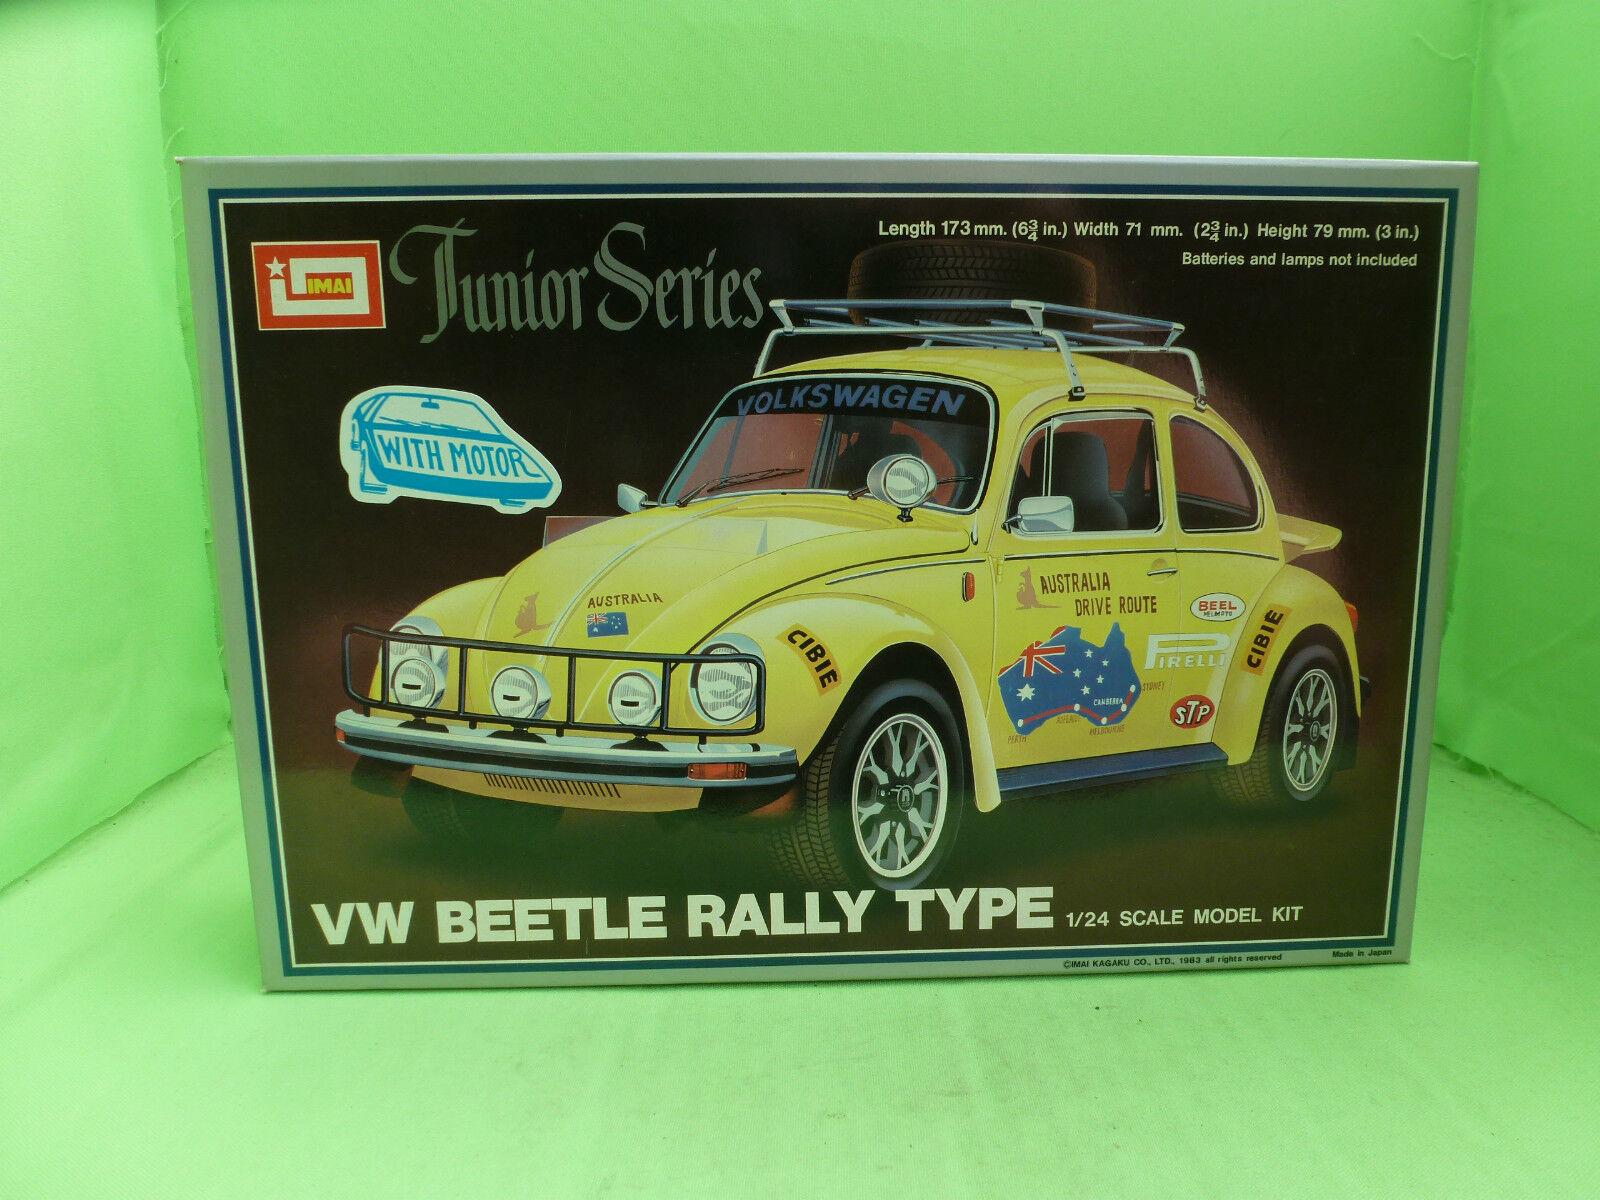 IMAI 11 B-1323 VW BEETLE KAFER RALLY TYPE 1 24 - UNBUILT INBOX COMPLETE -